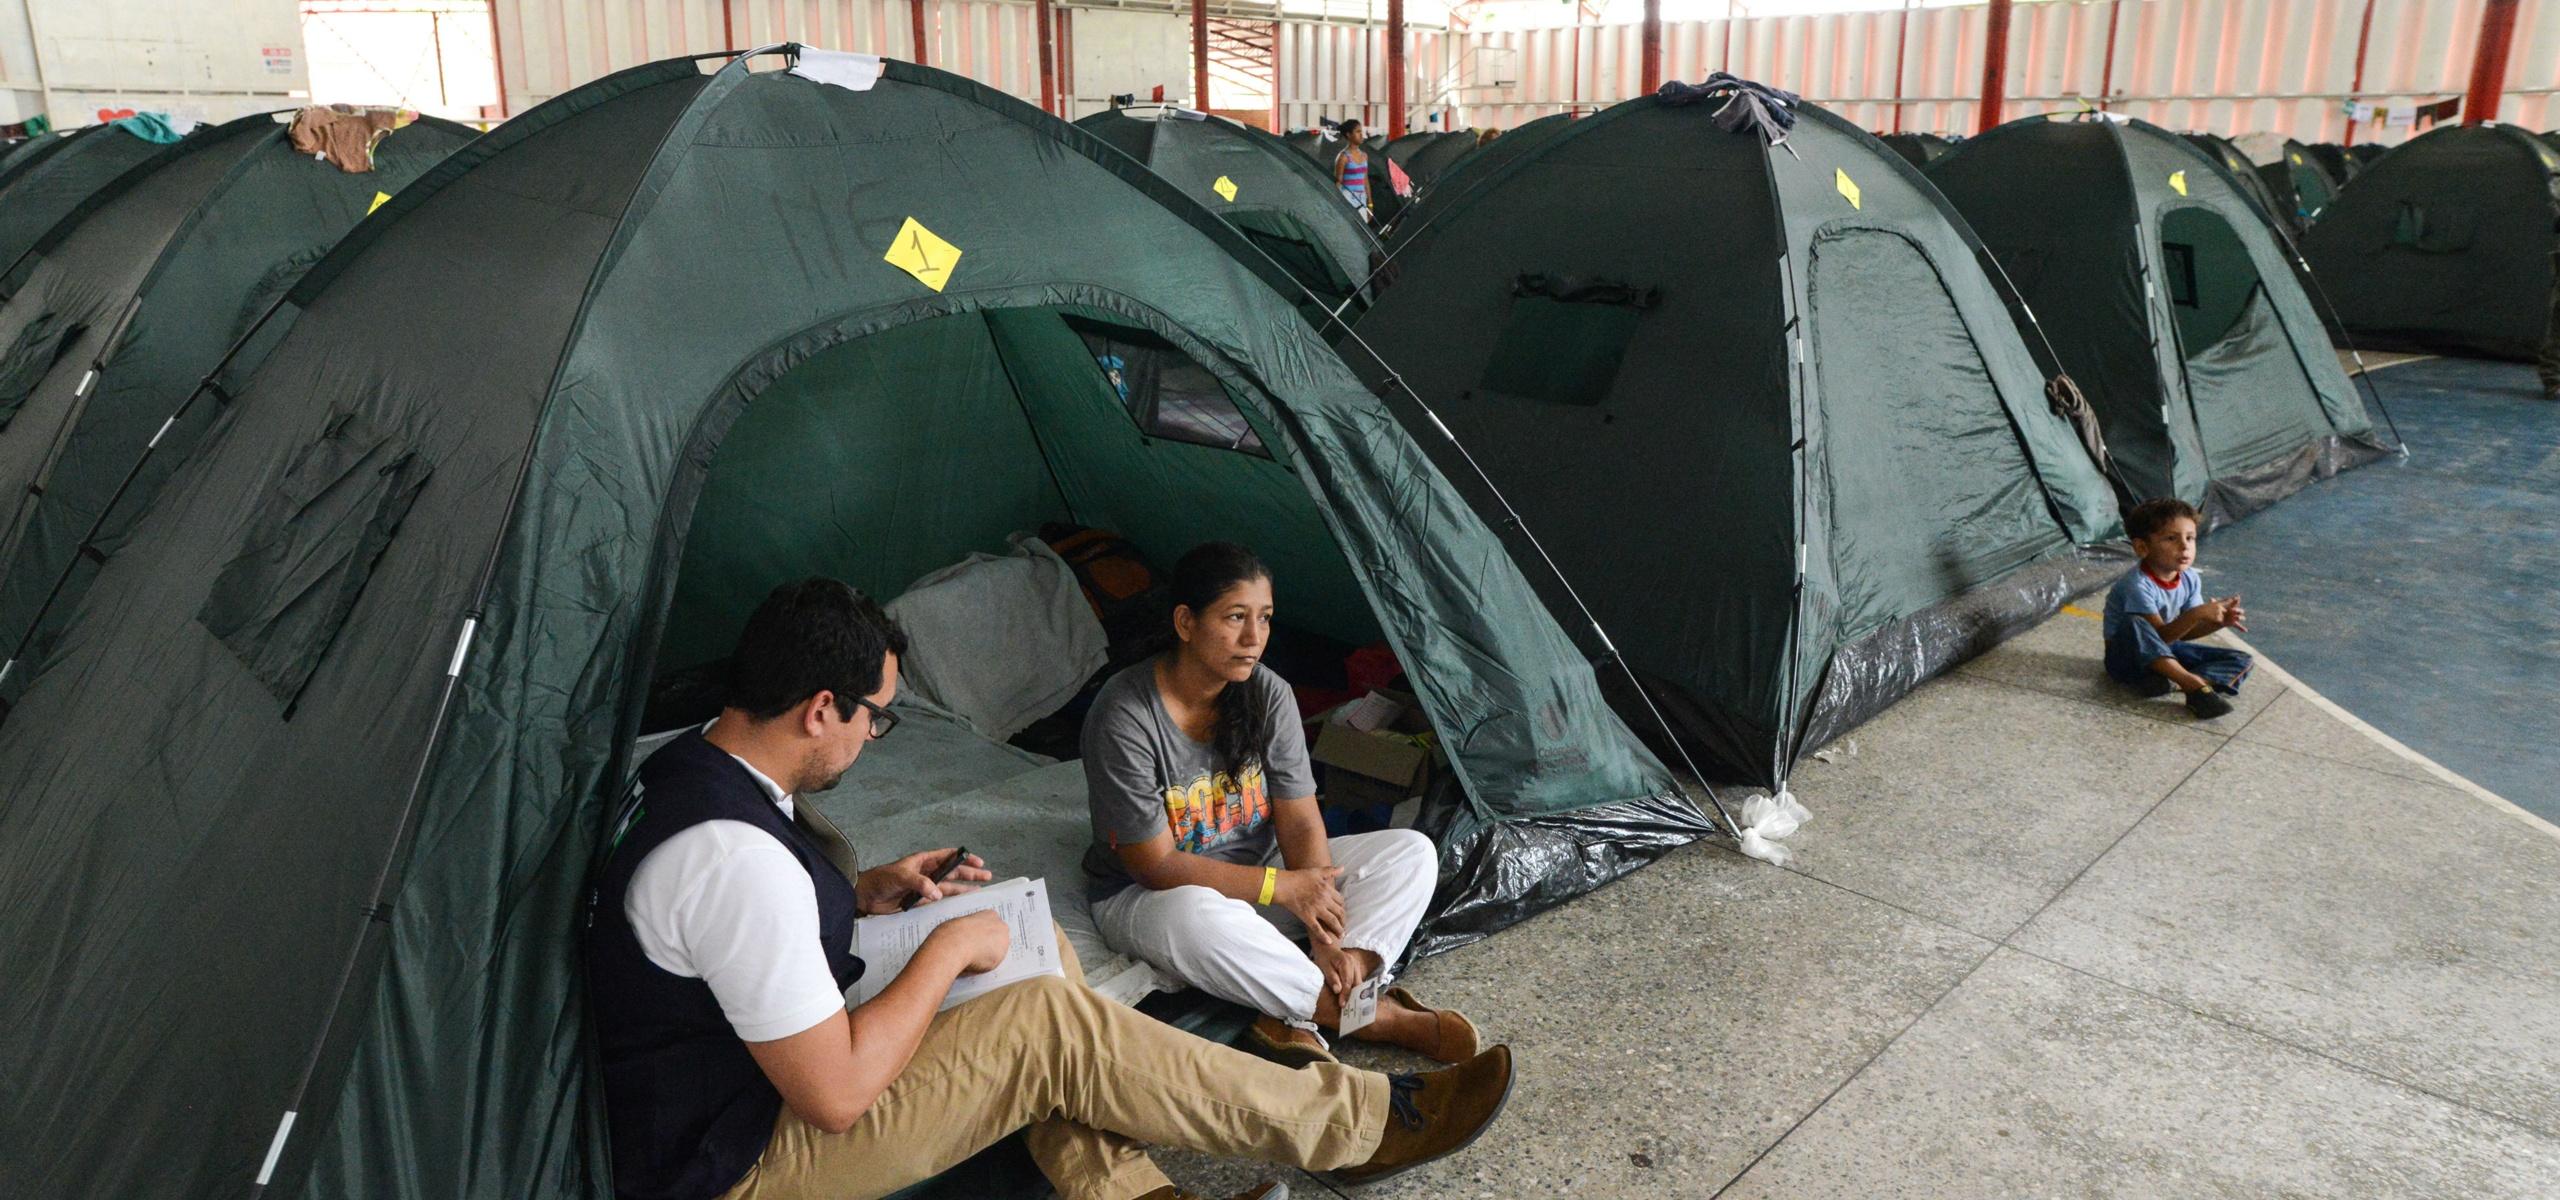 A Venezuelan Refugee Crisis